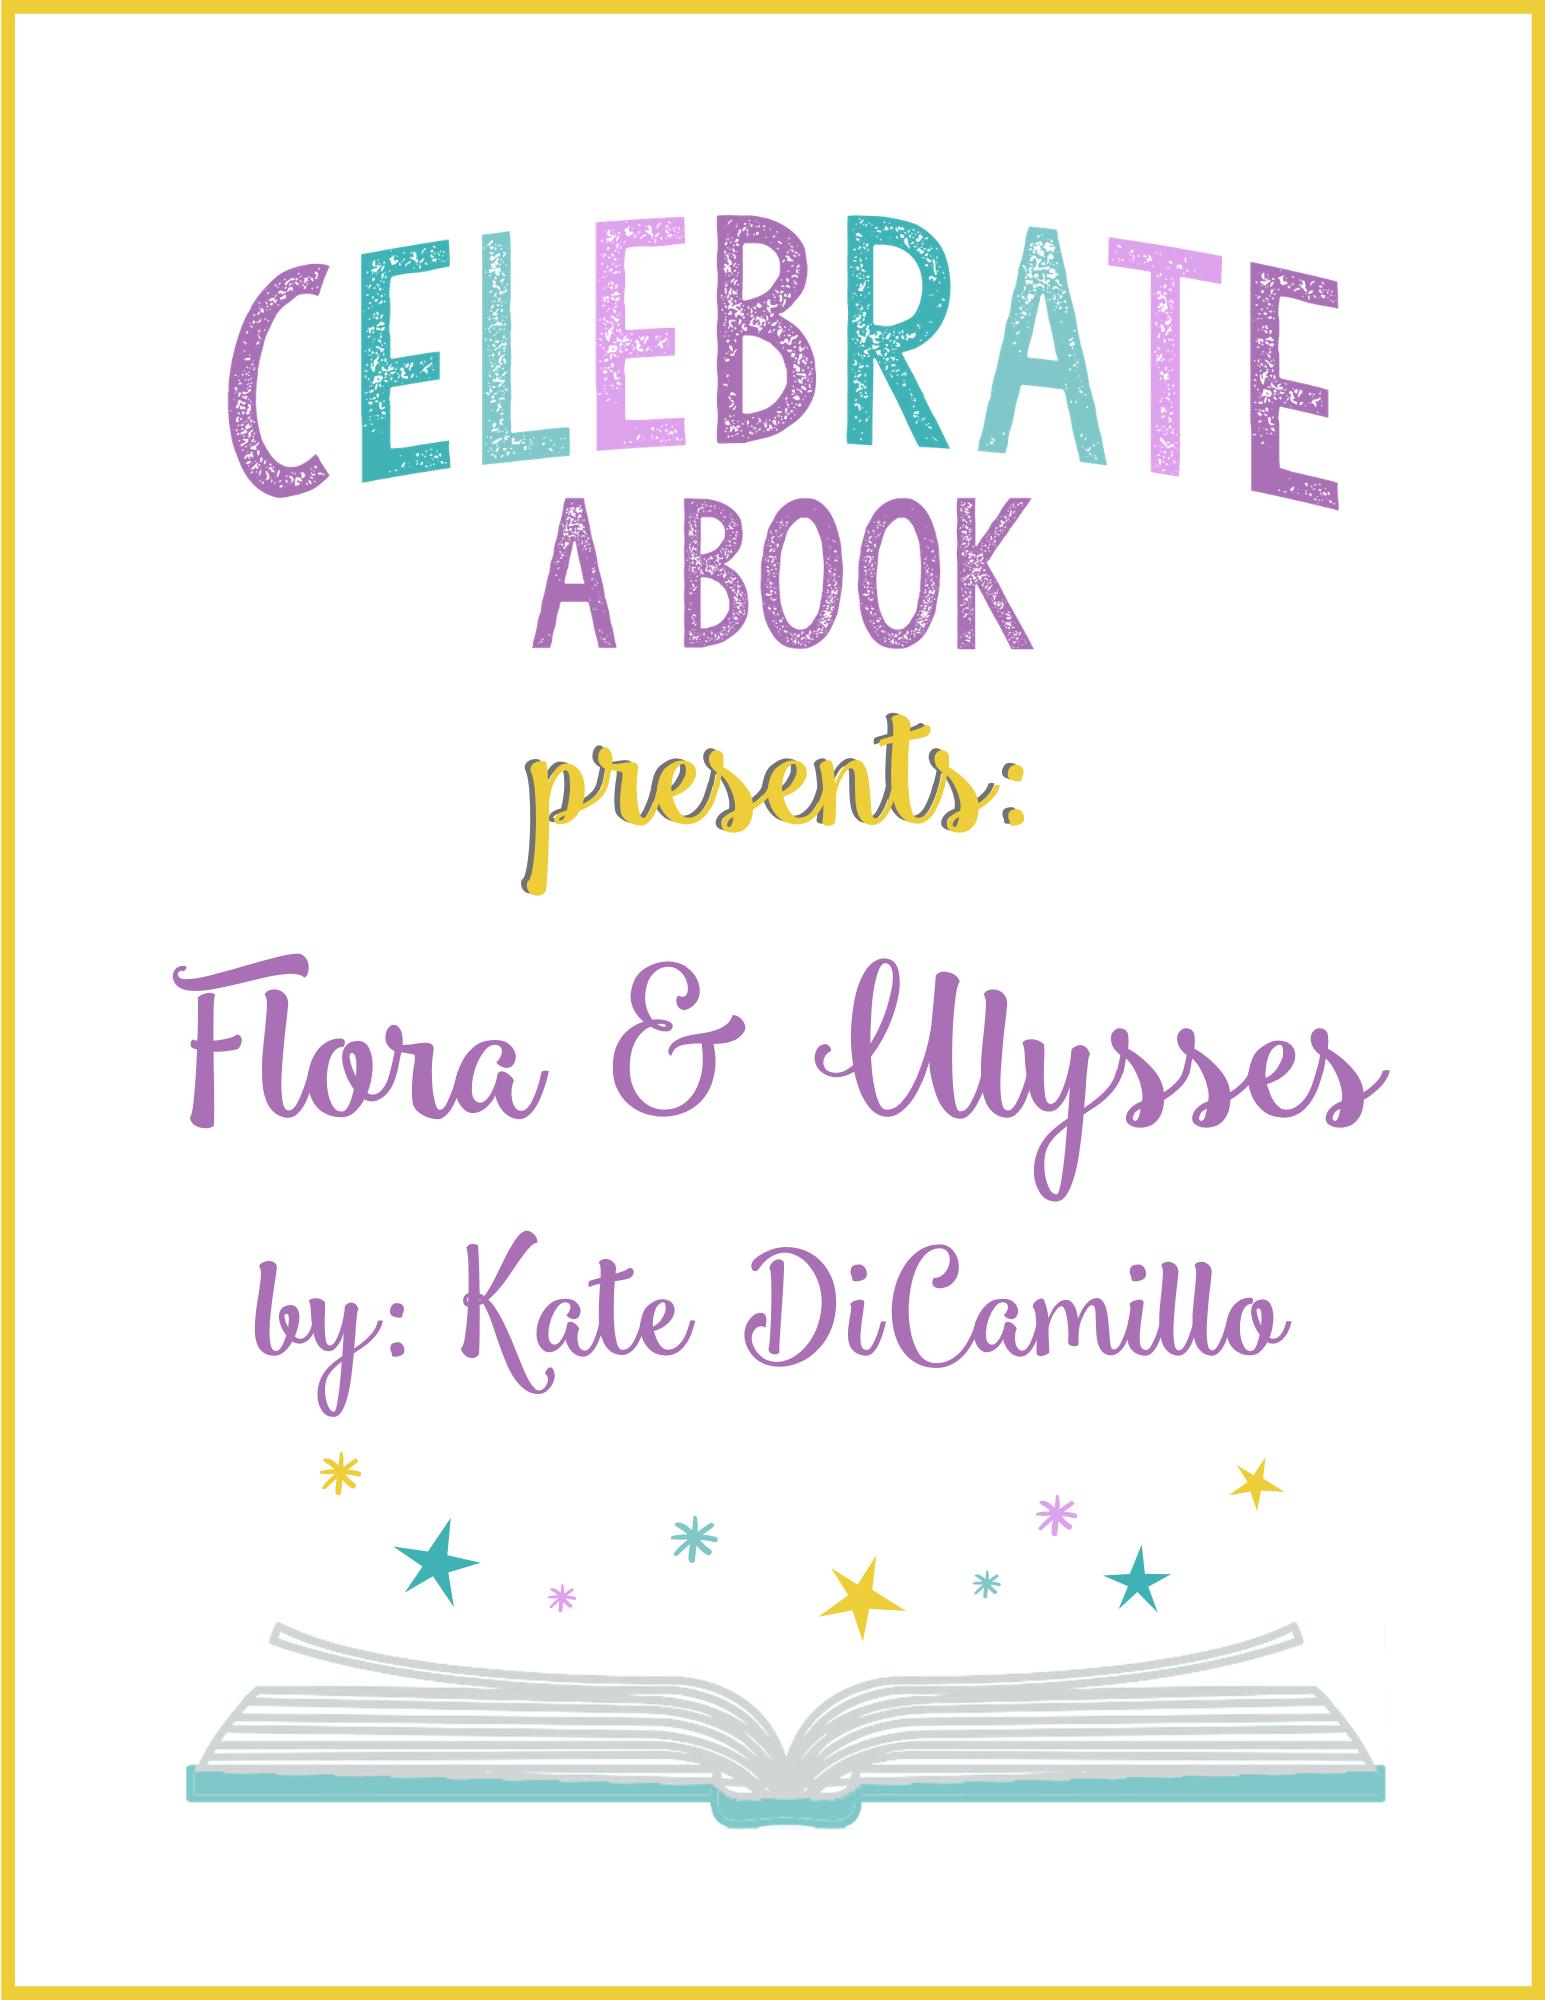 Flora & Ulysses Book Club Guide